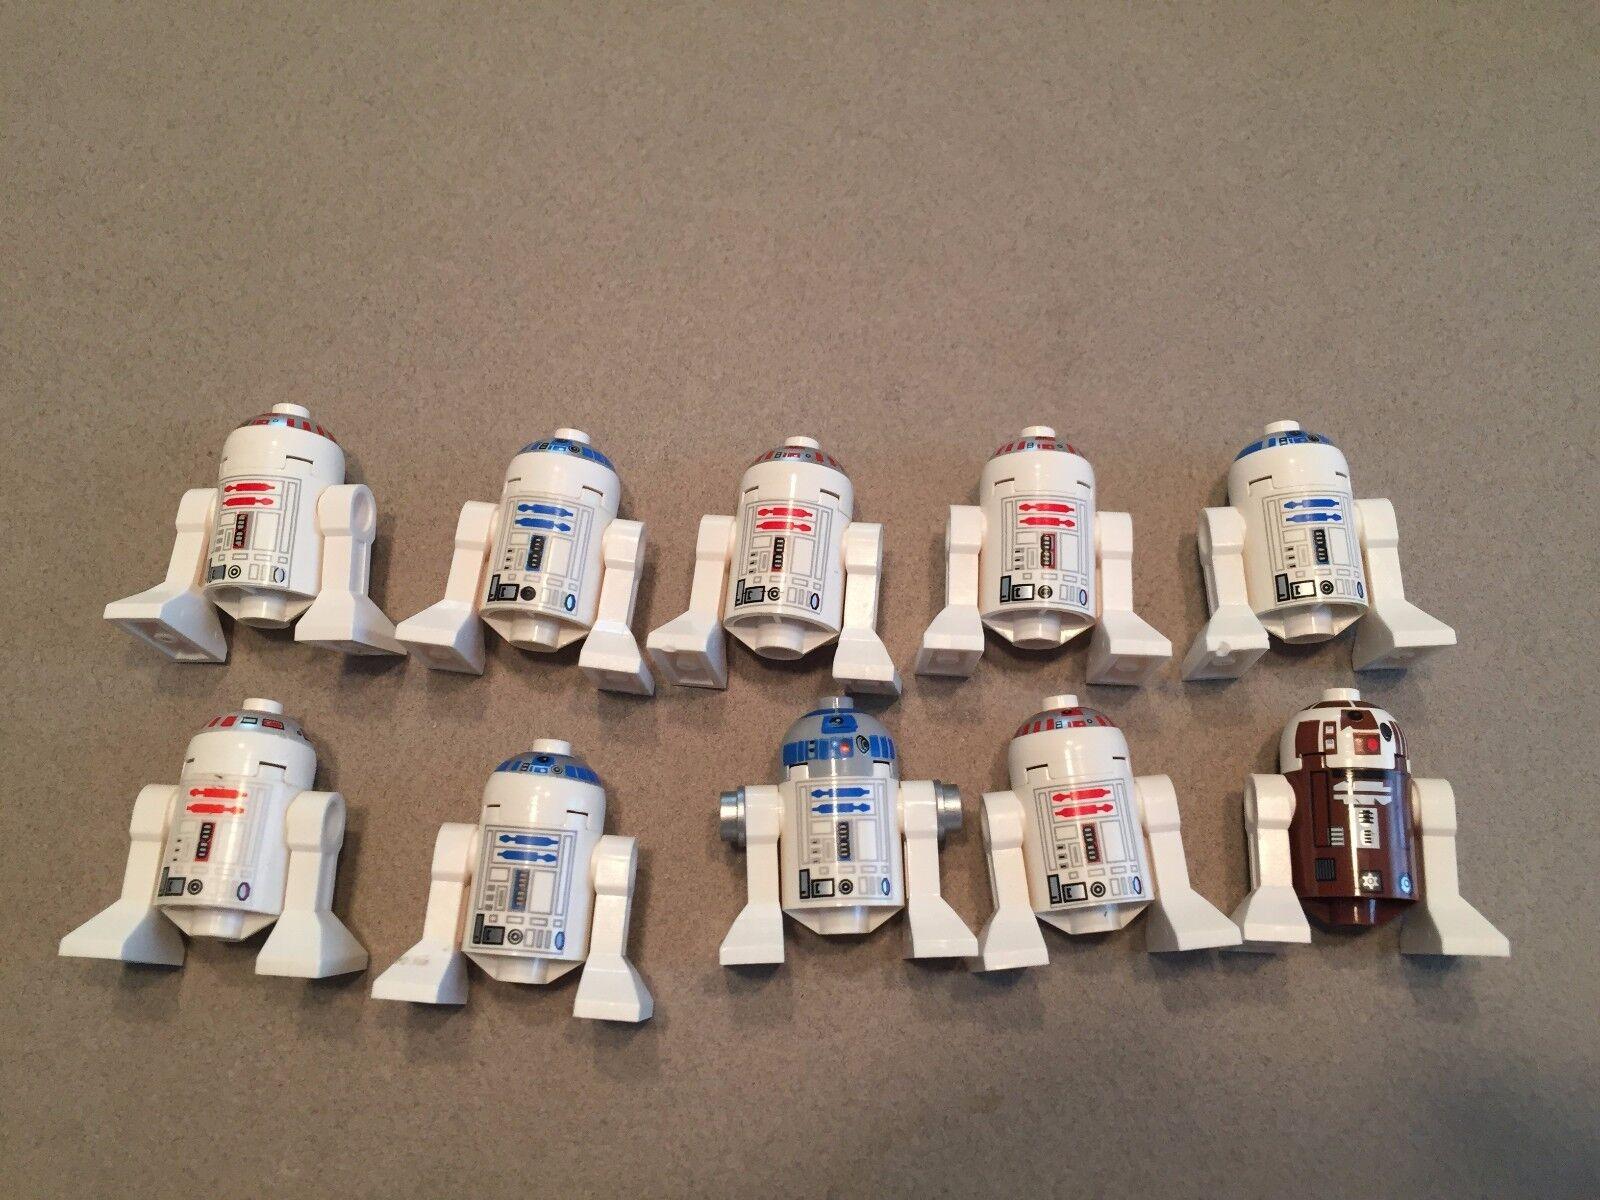 LEGO Star Wars Astromech Droid Lot of 10 minifig  R2-D2 R5-D4 A382